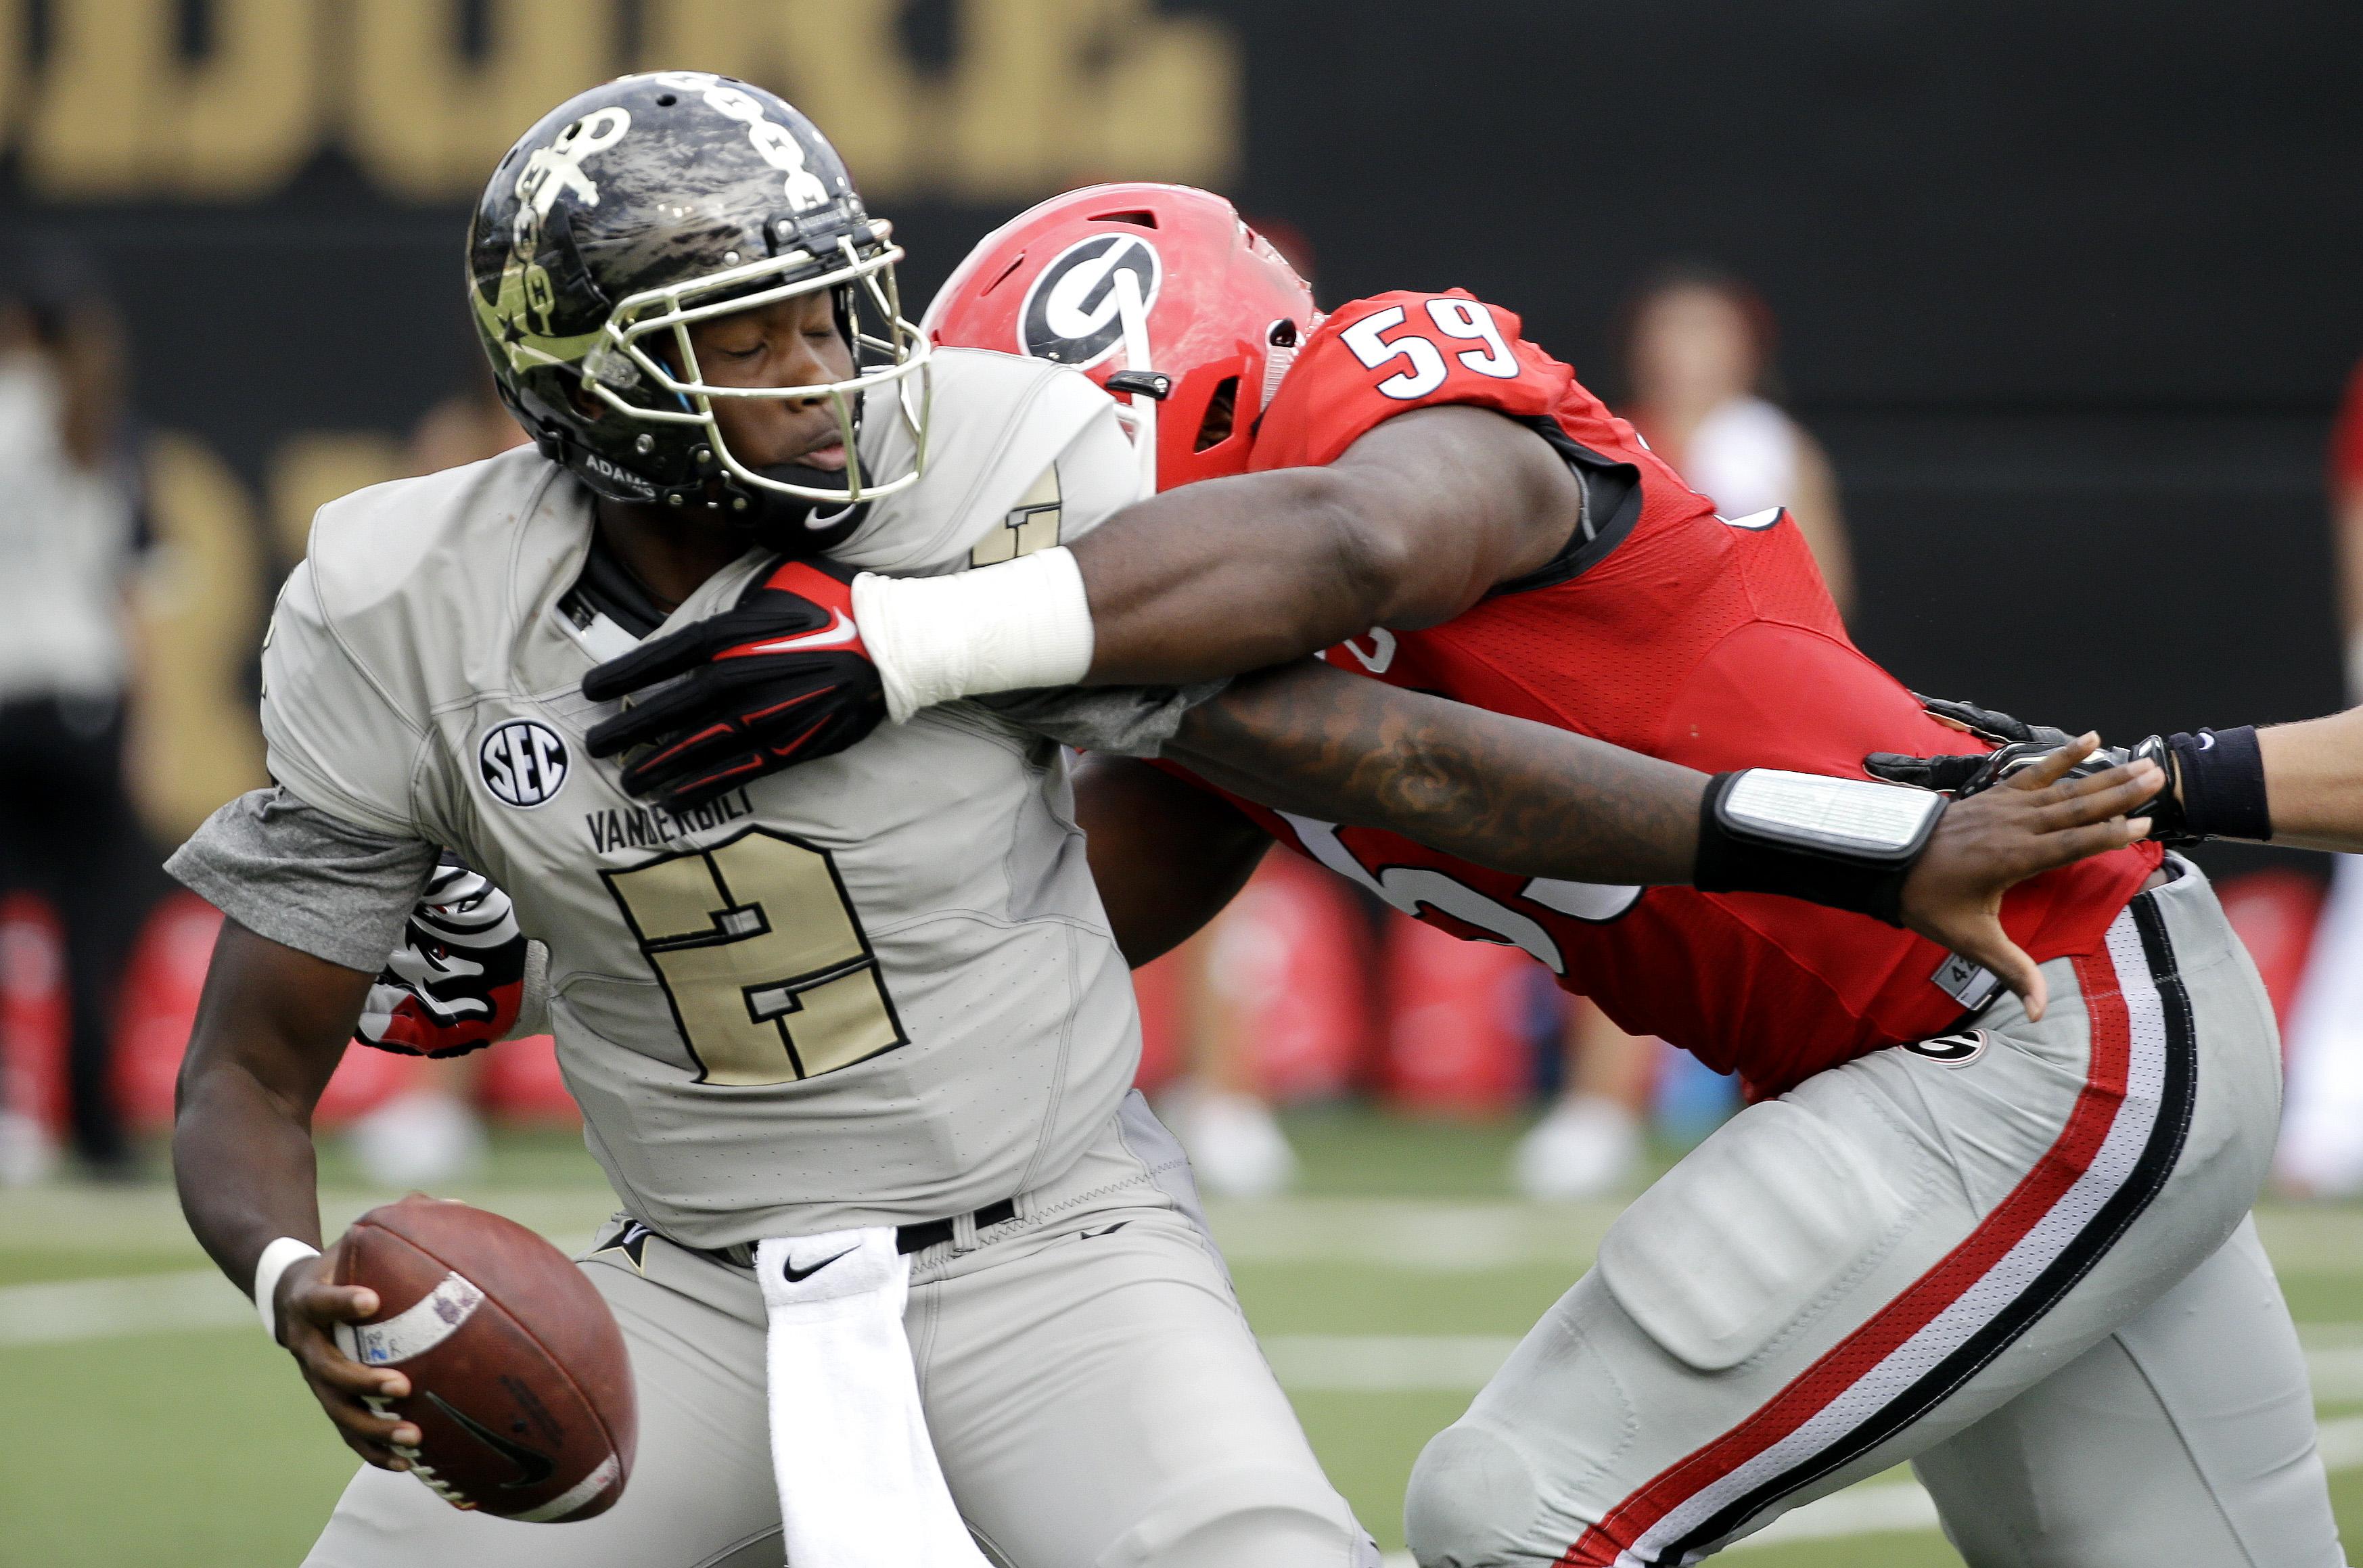 Vanderbilt quarterback Johnny McCrary (2) is sacked by Georgia linebacker Jordan Jenkins (59) for a 7-yard loss in the first half of an NCAA college football game Saturday, Sept. 12, 2015, in Nashville, Tenn. (AP Photo/Mark Humphrey)